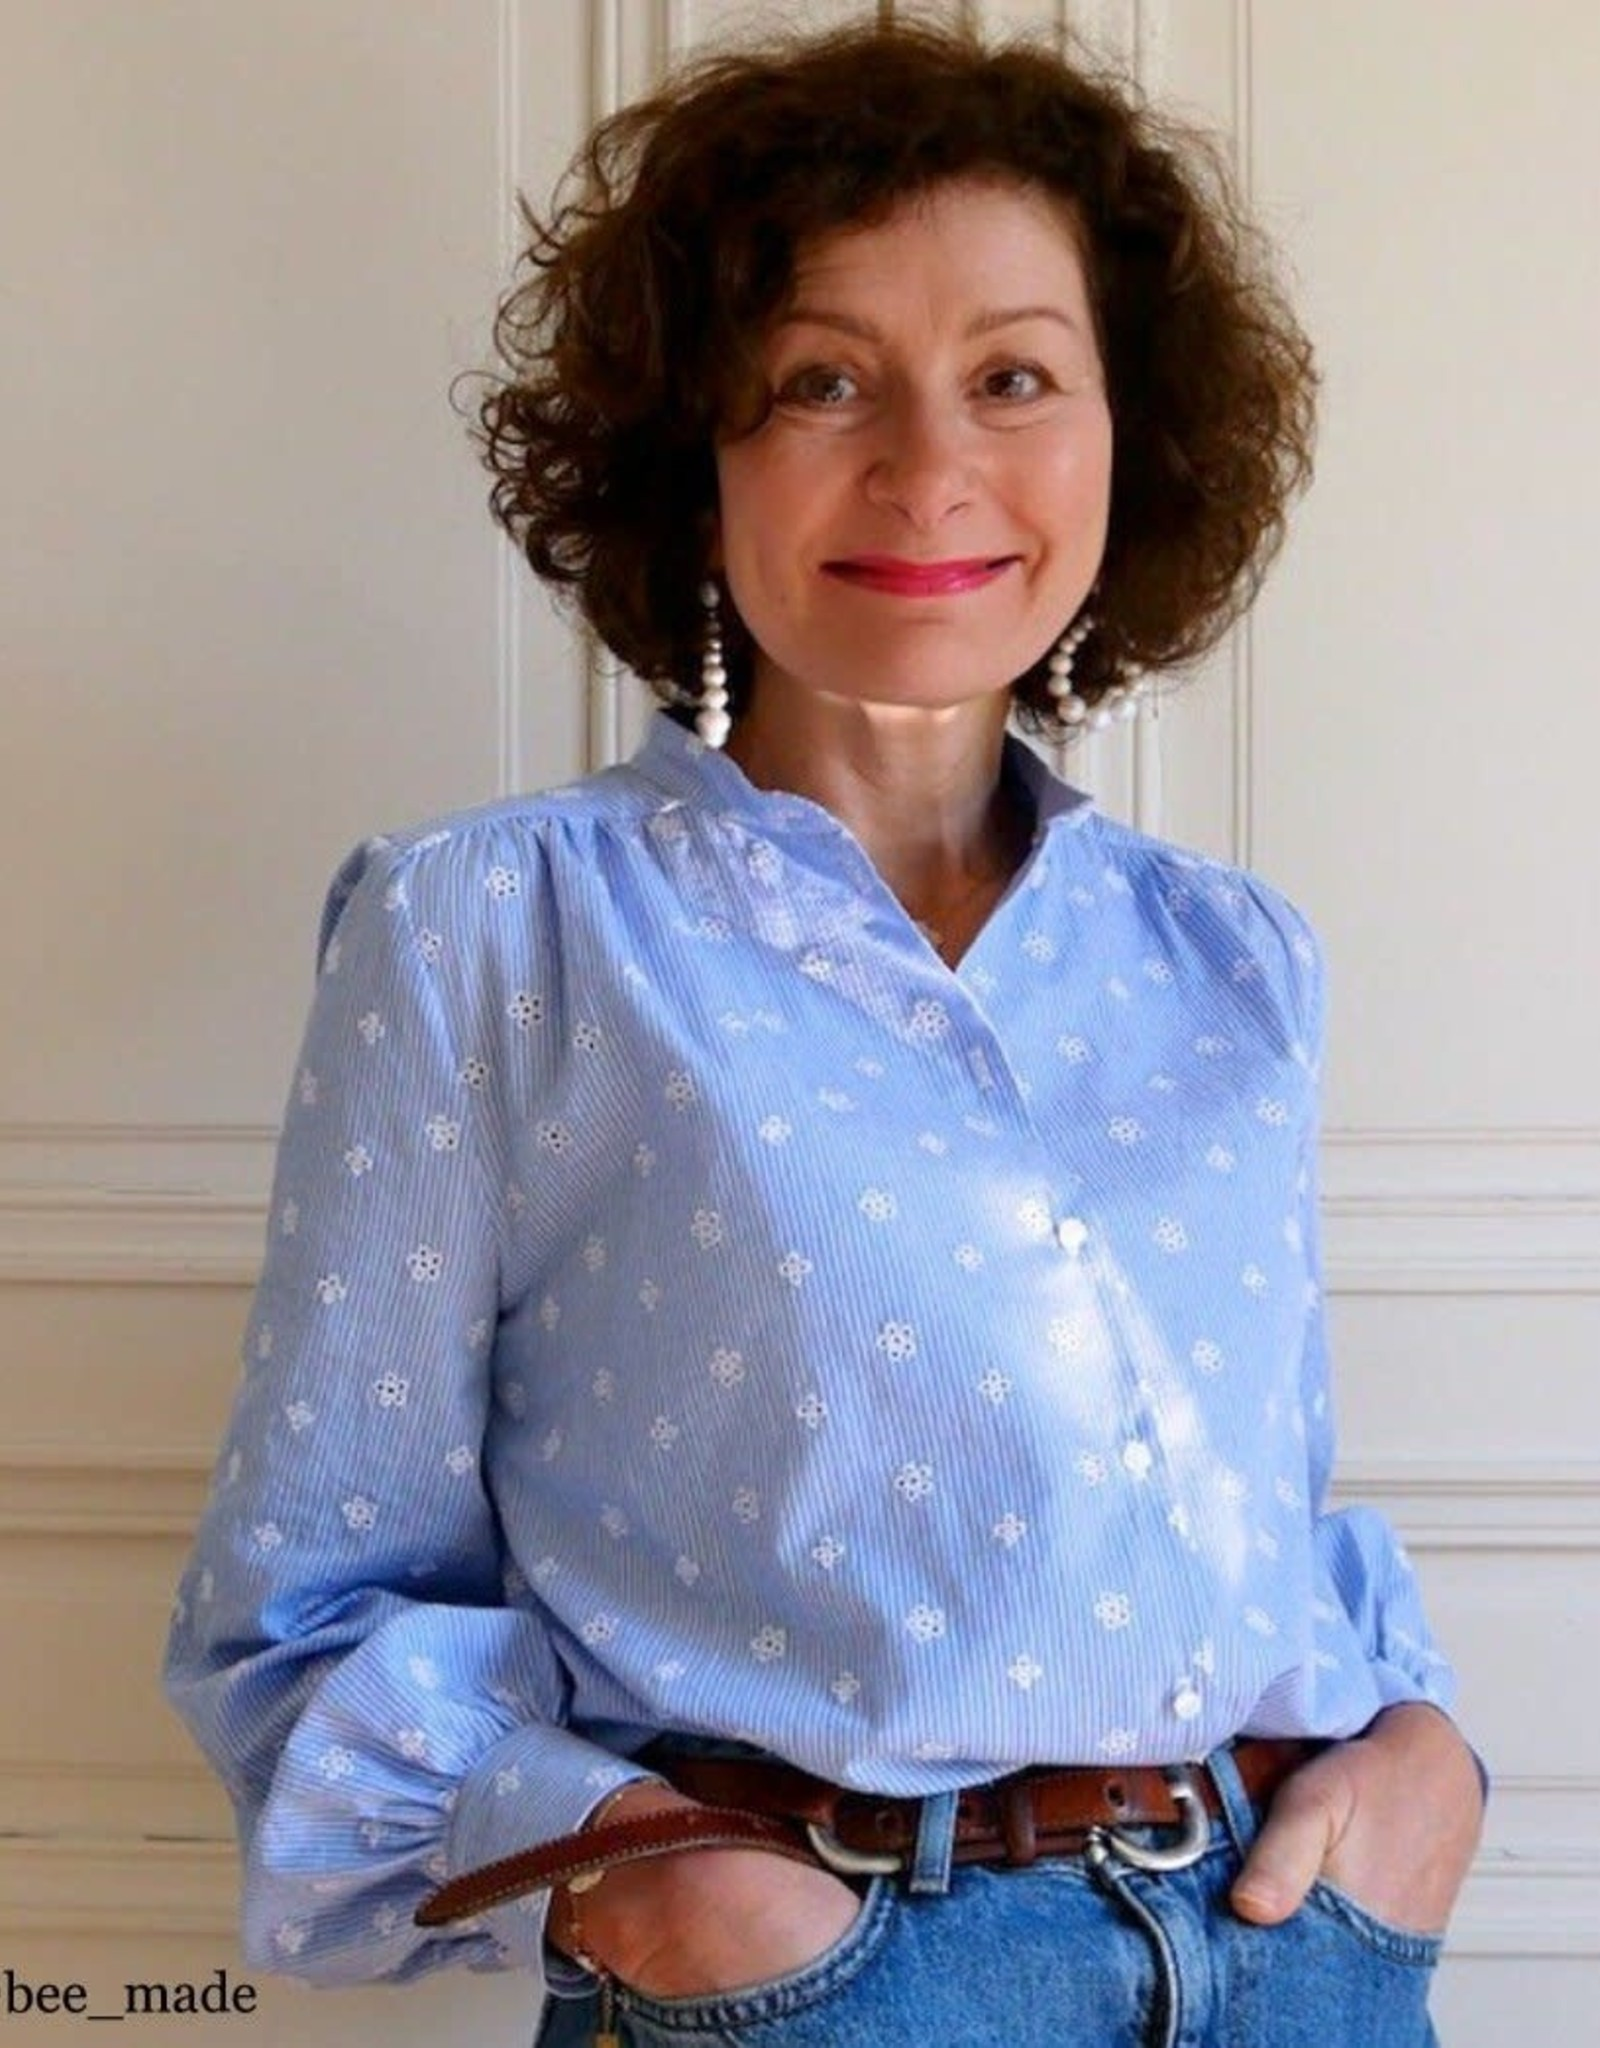 Ikatee Alex mum blouse or dress